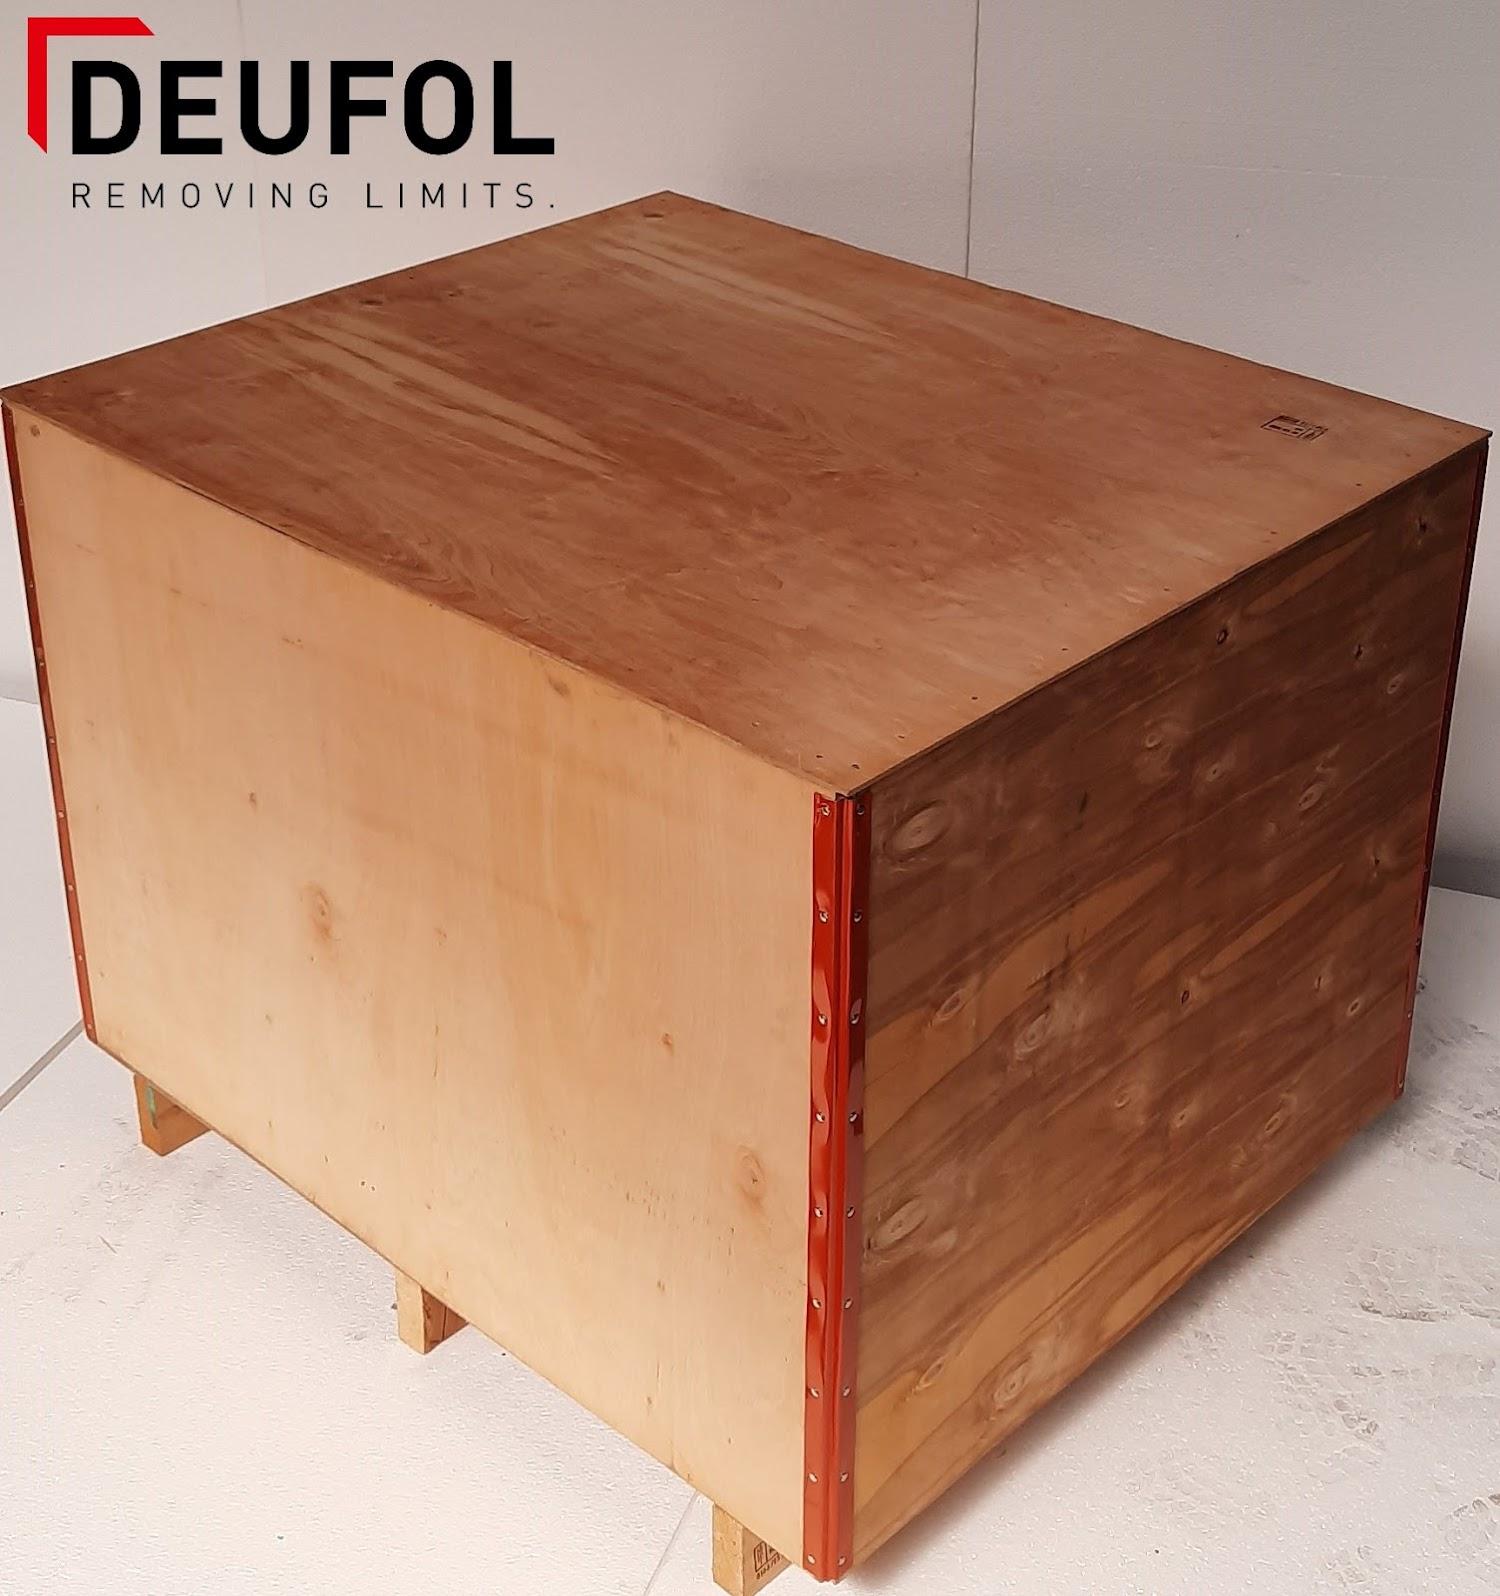 Houten transportkist met deksel  120x80x92cm